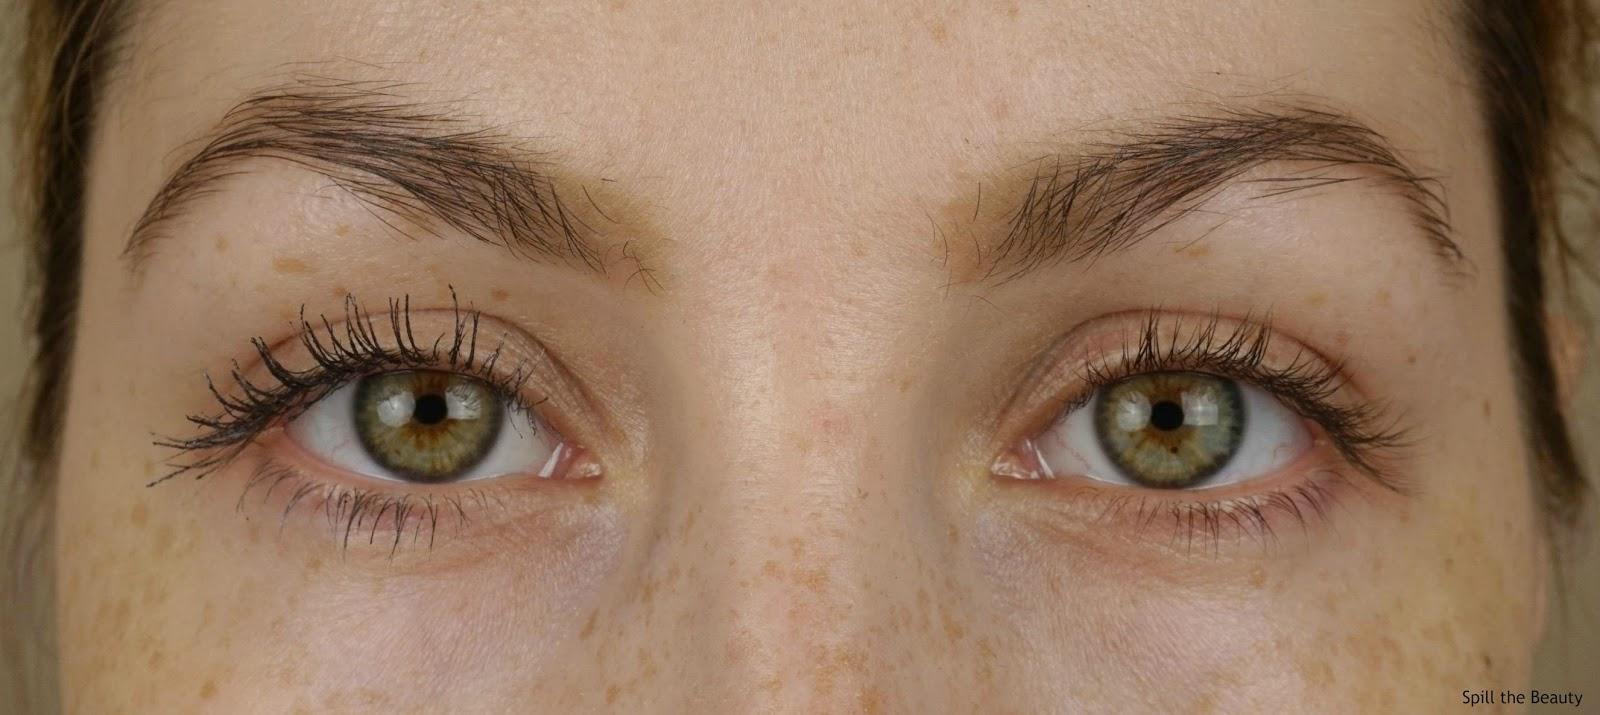 dior diorshow mascara pro anthracite 088 review comparison